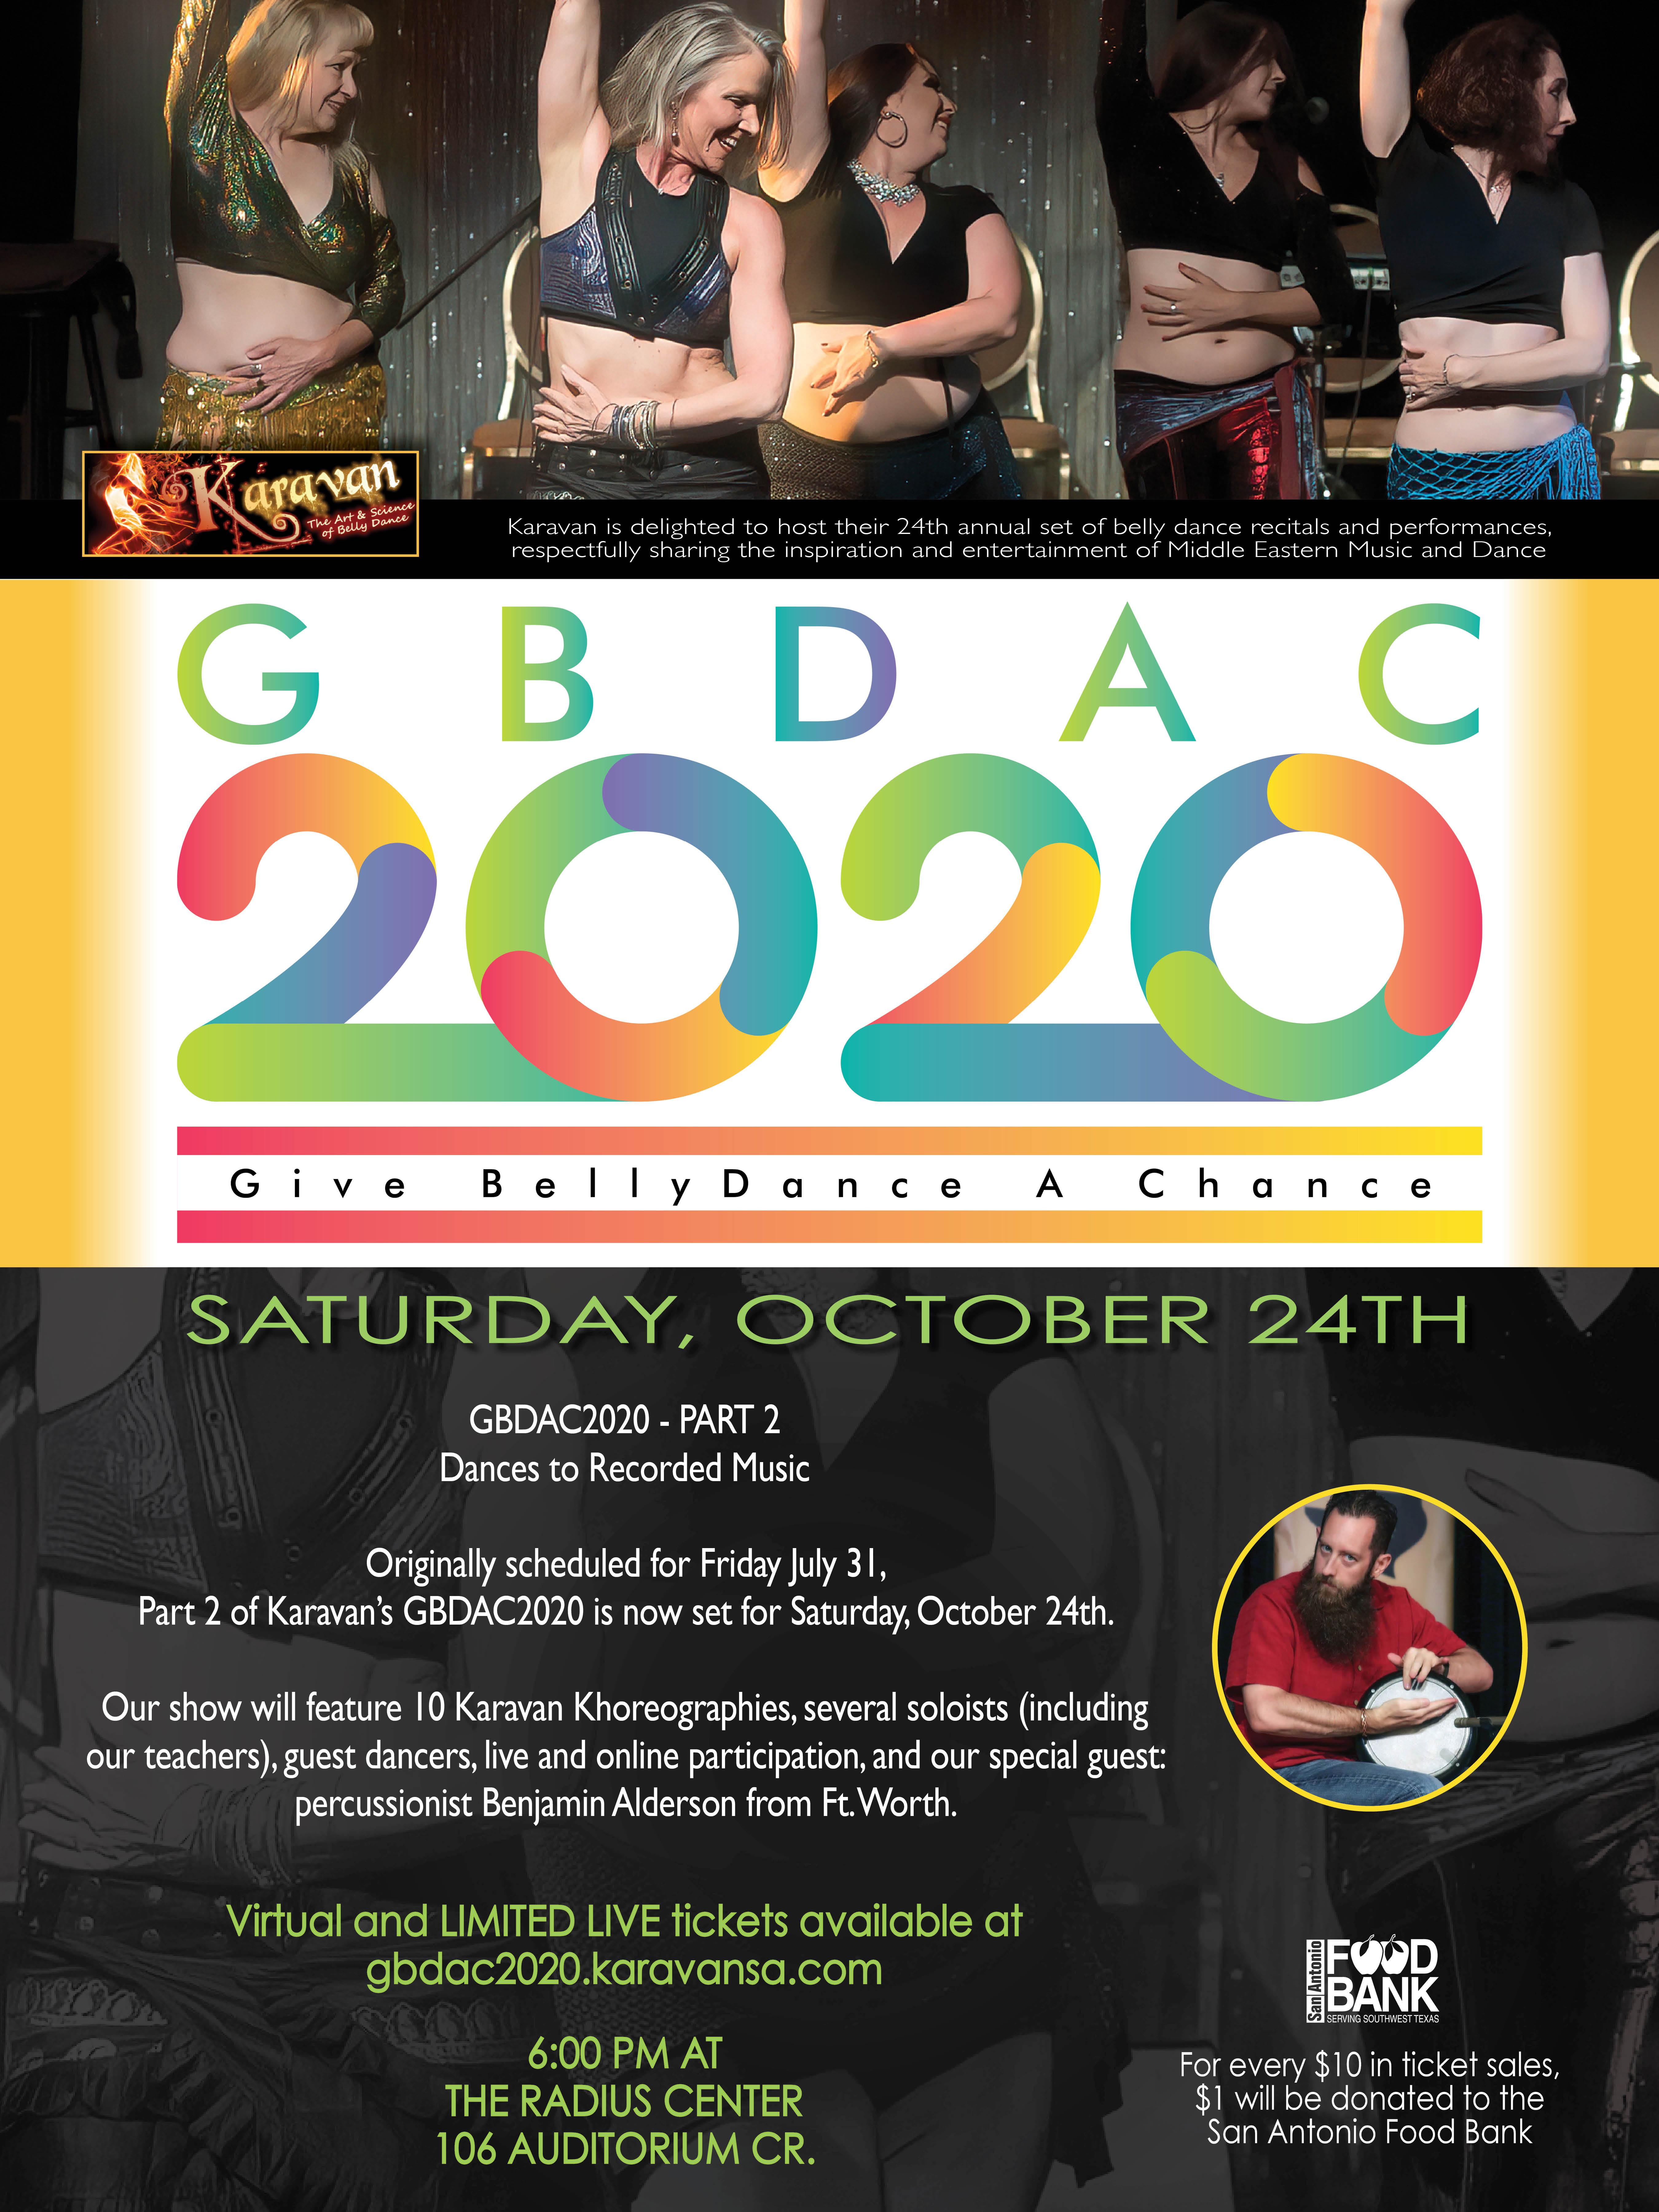 GBDAC2020